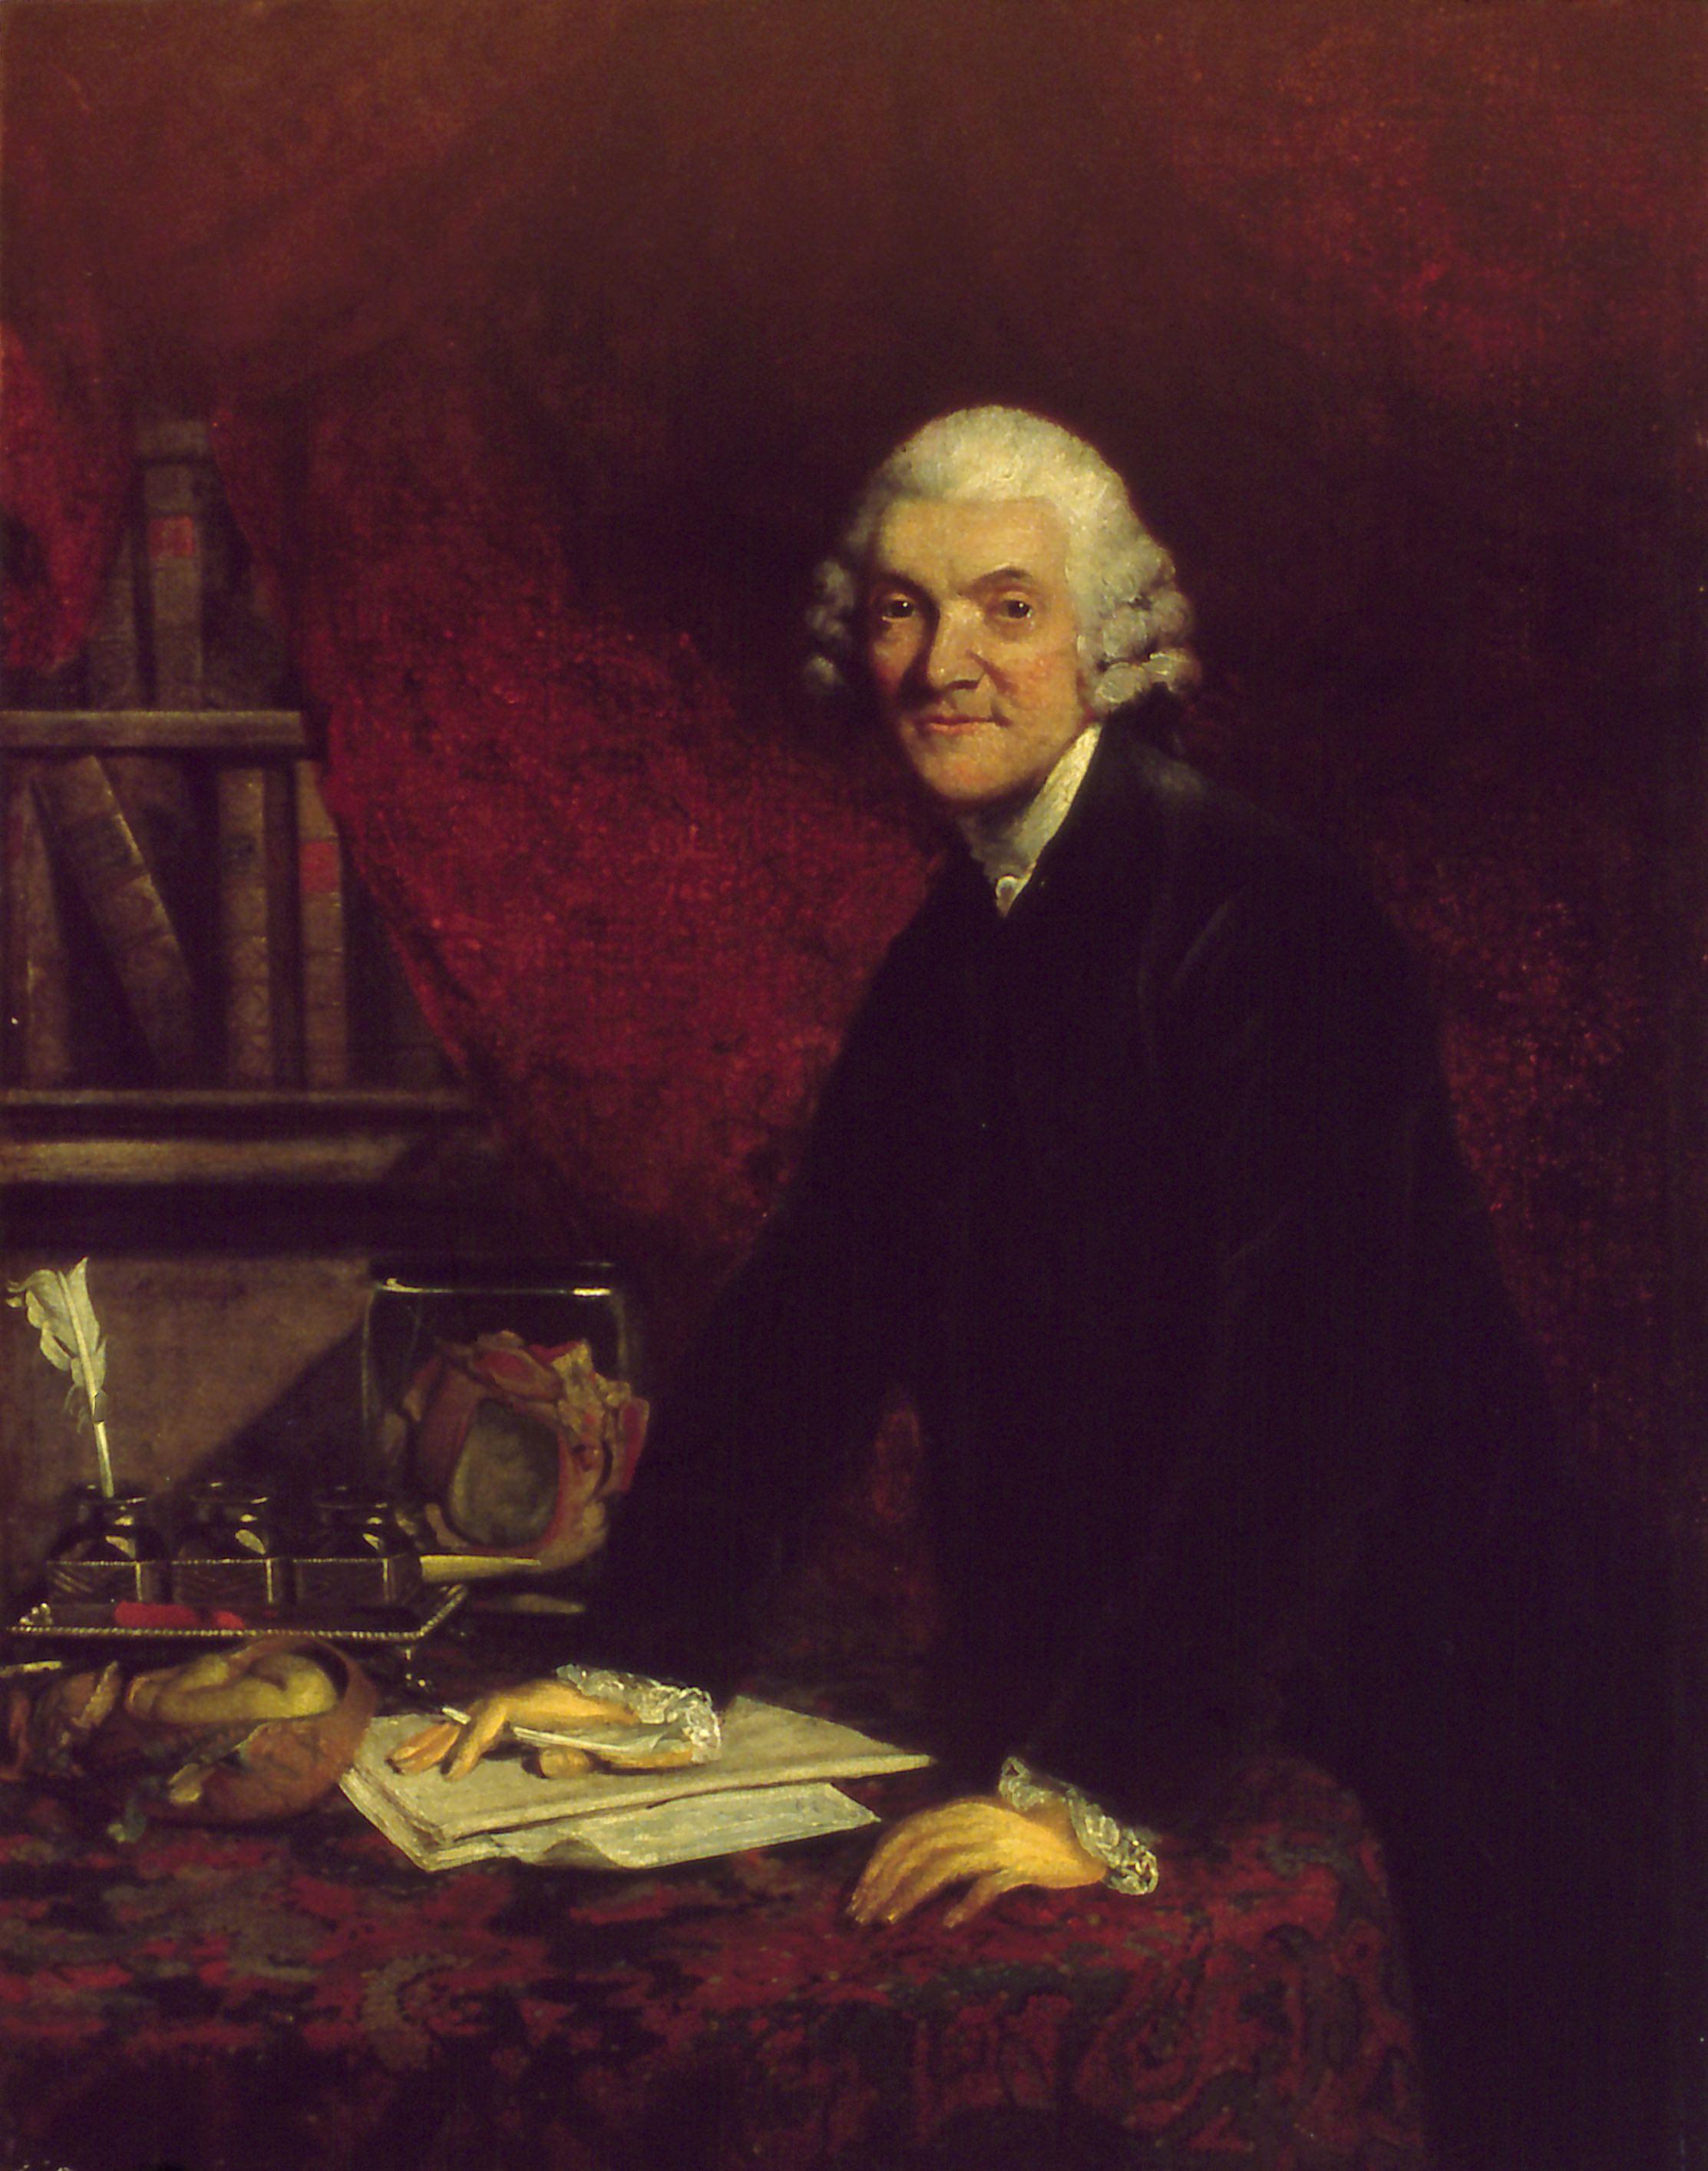 William Hunter, by Joshua Reynolds. Original in the Hunterian Museum, Glasgow.